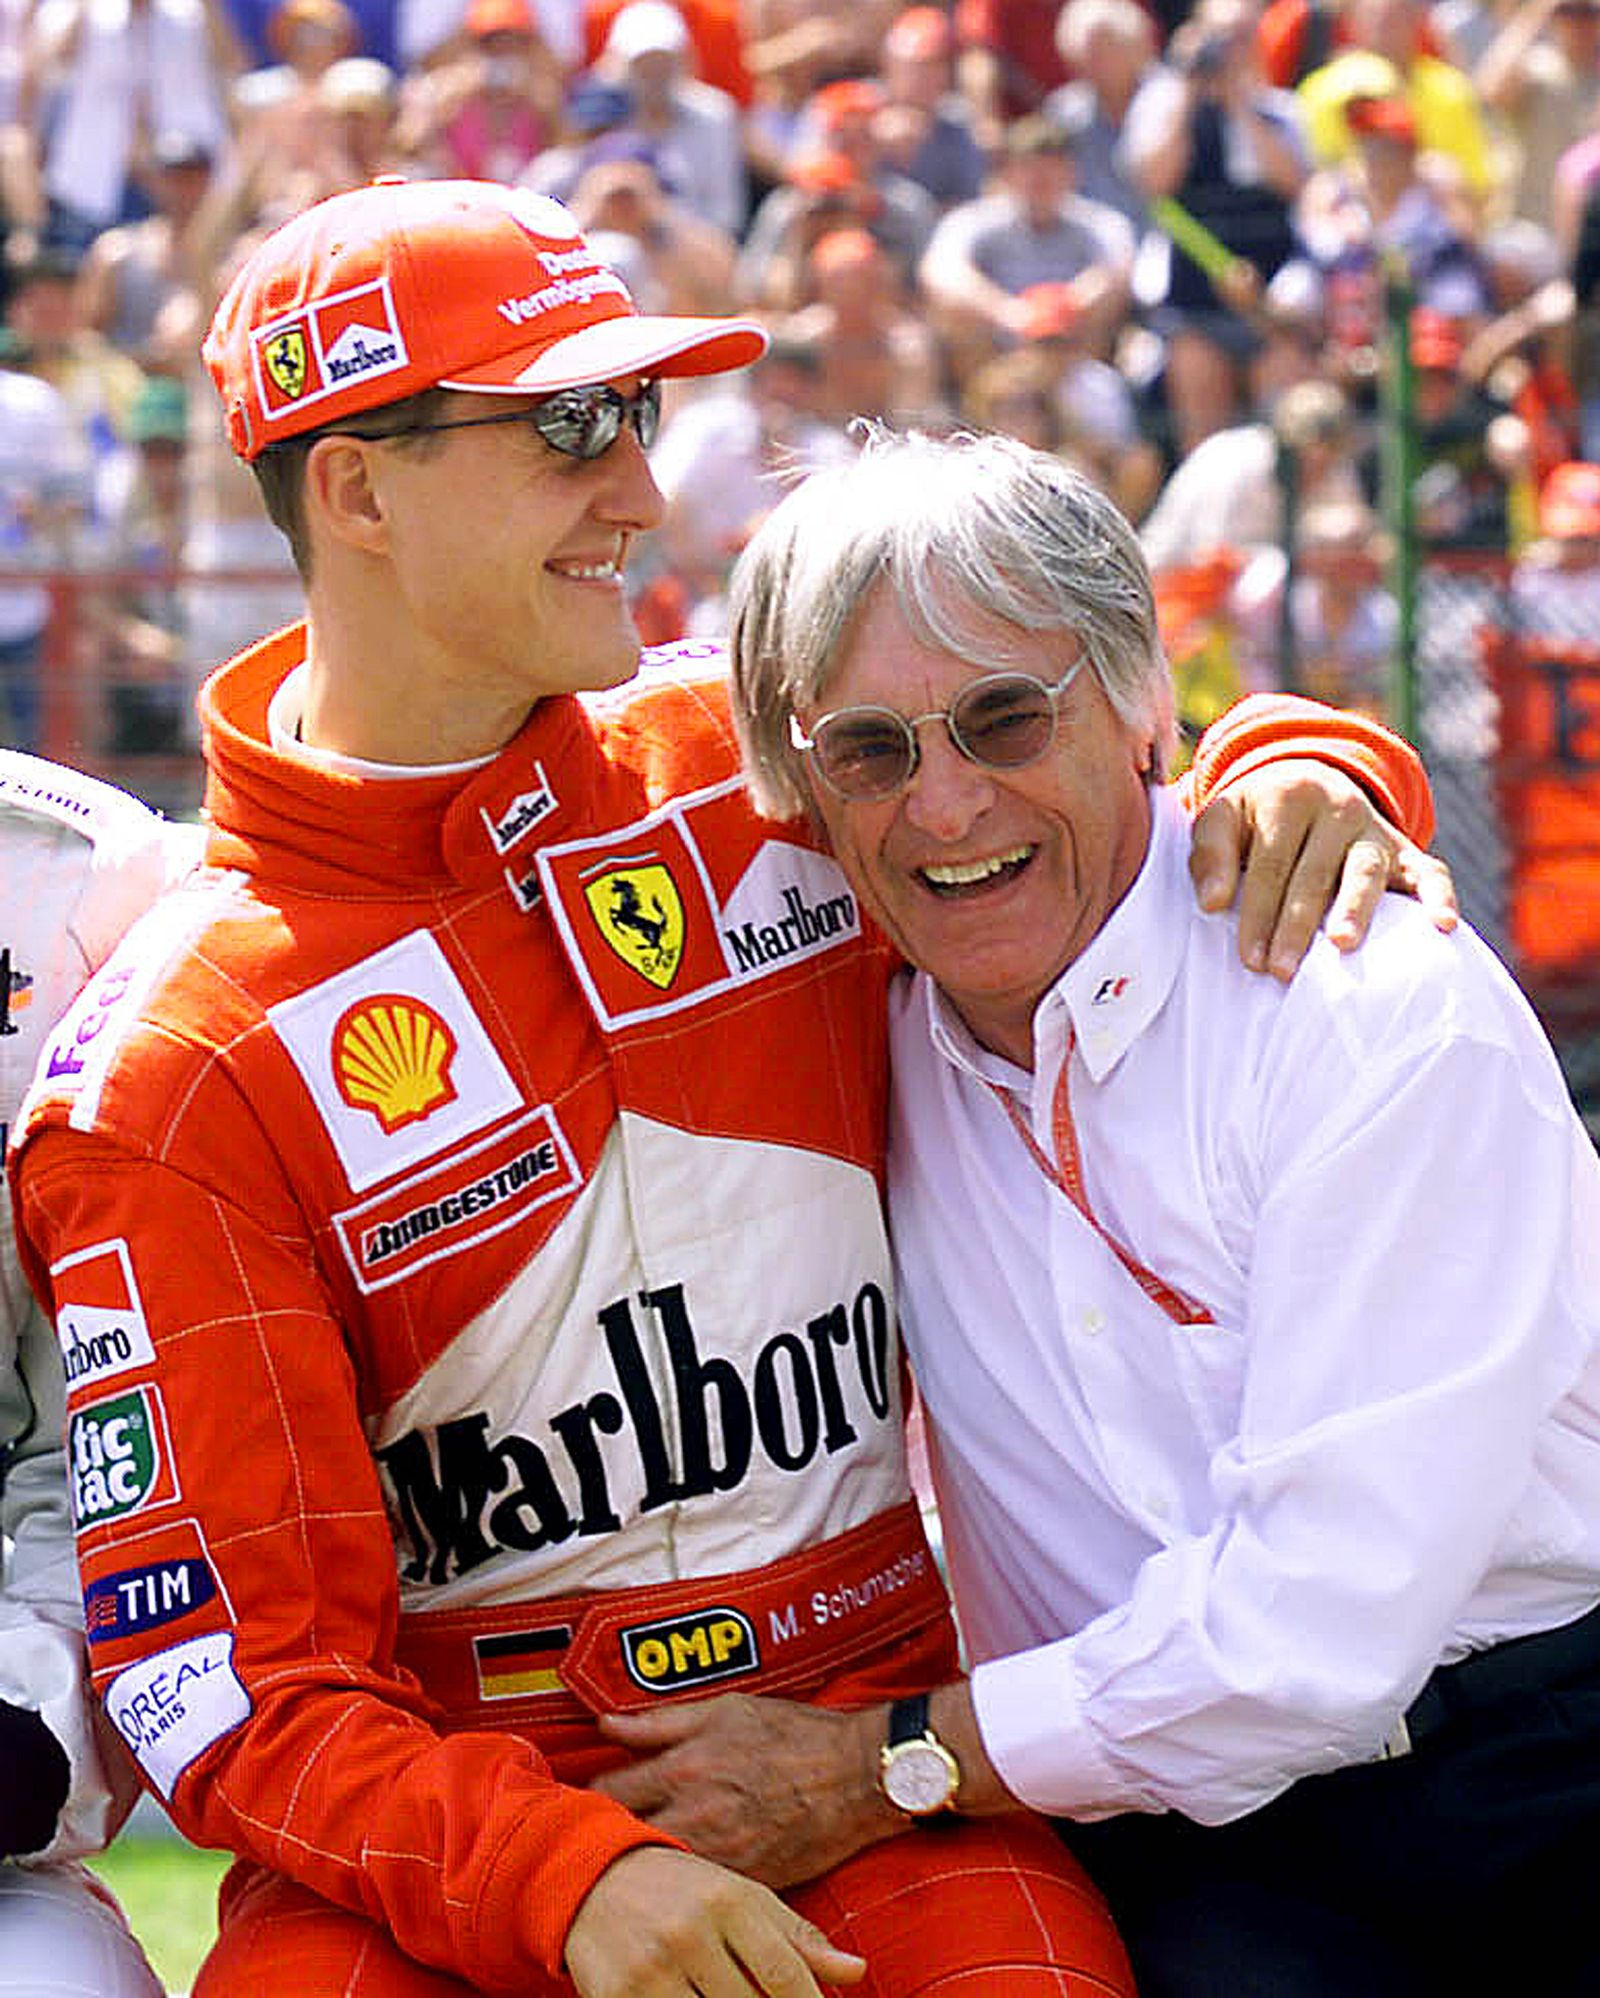 Bernie Ecclestone/ Schumacher